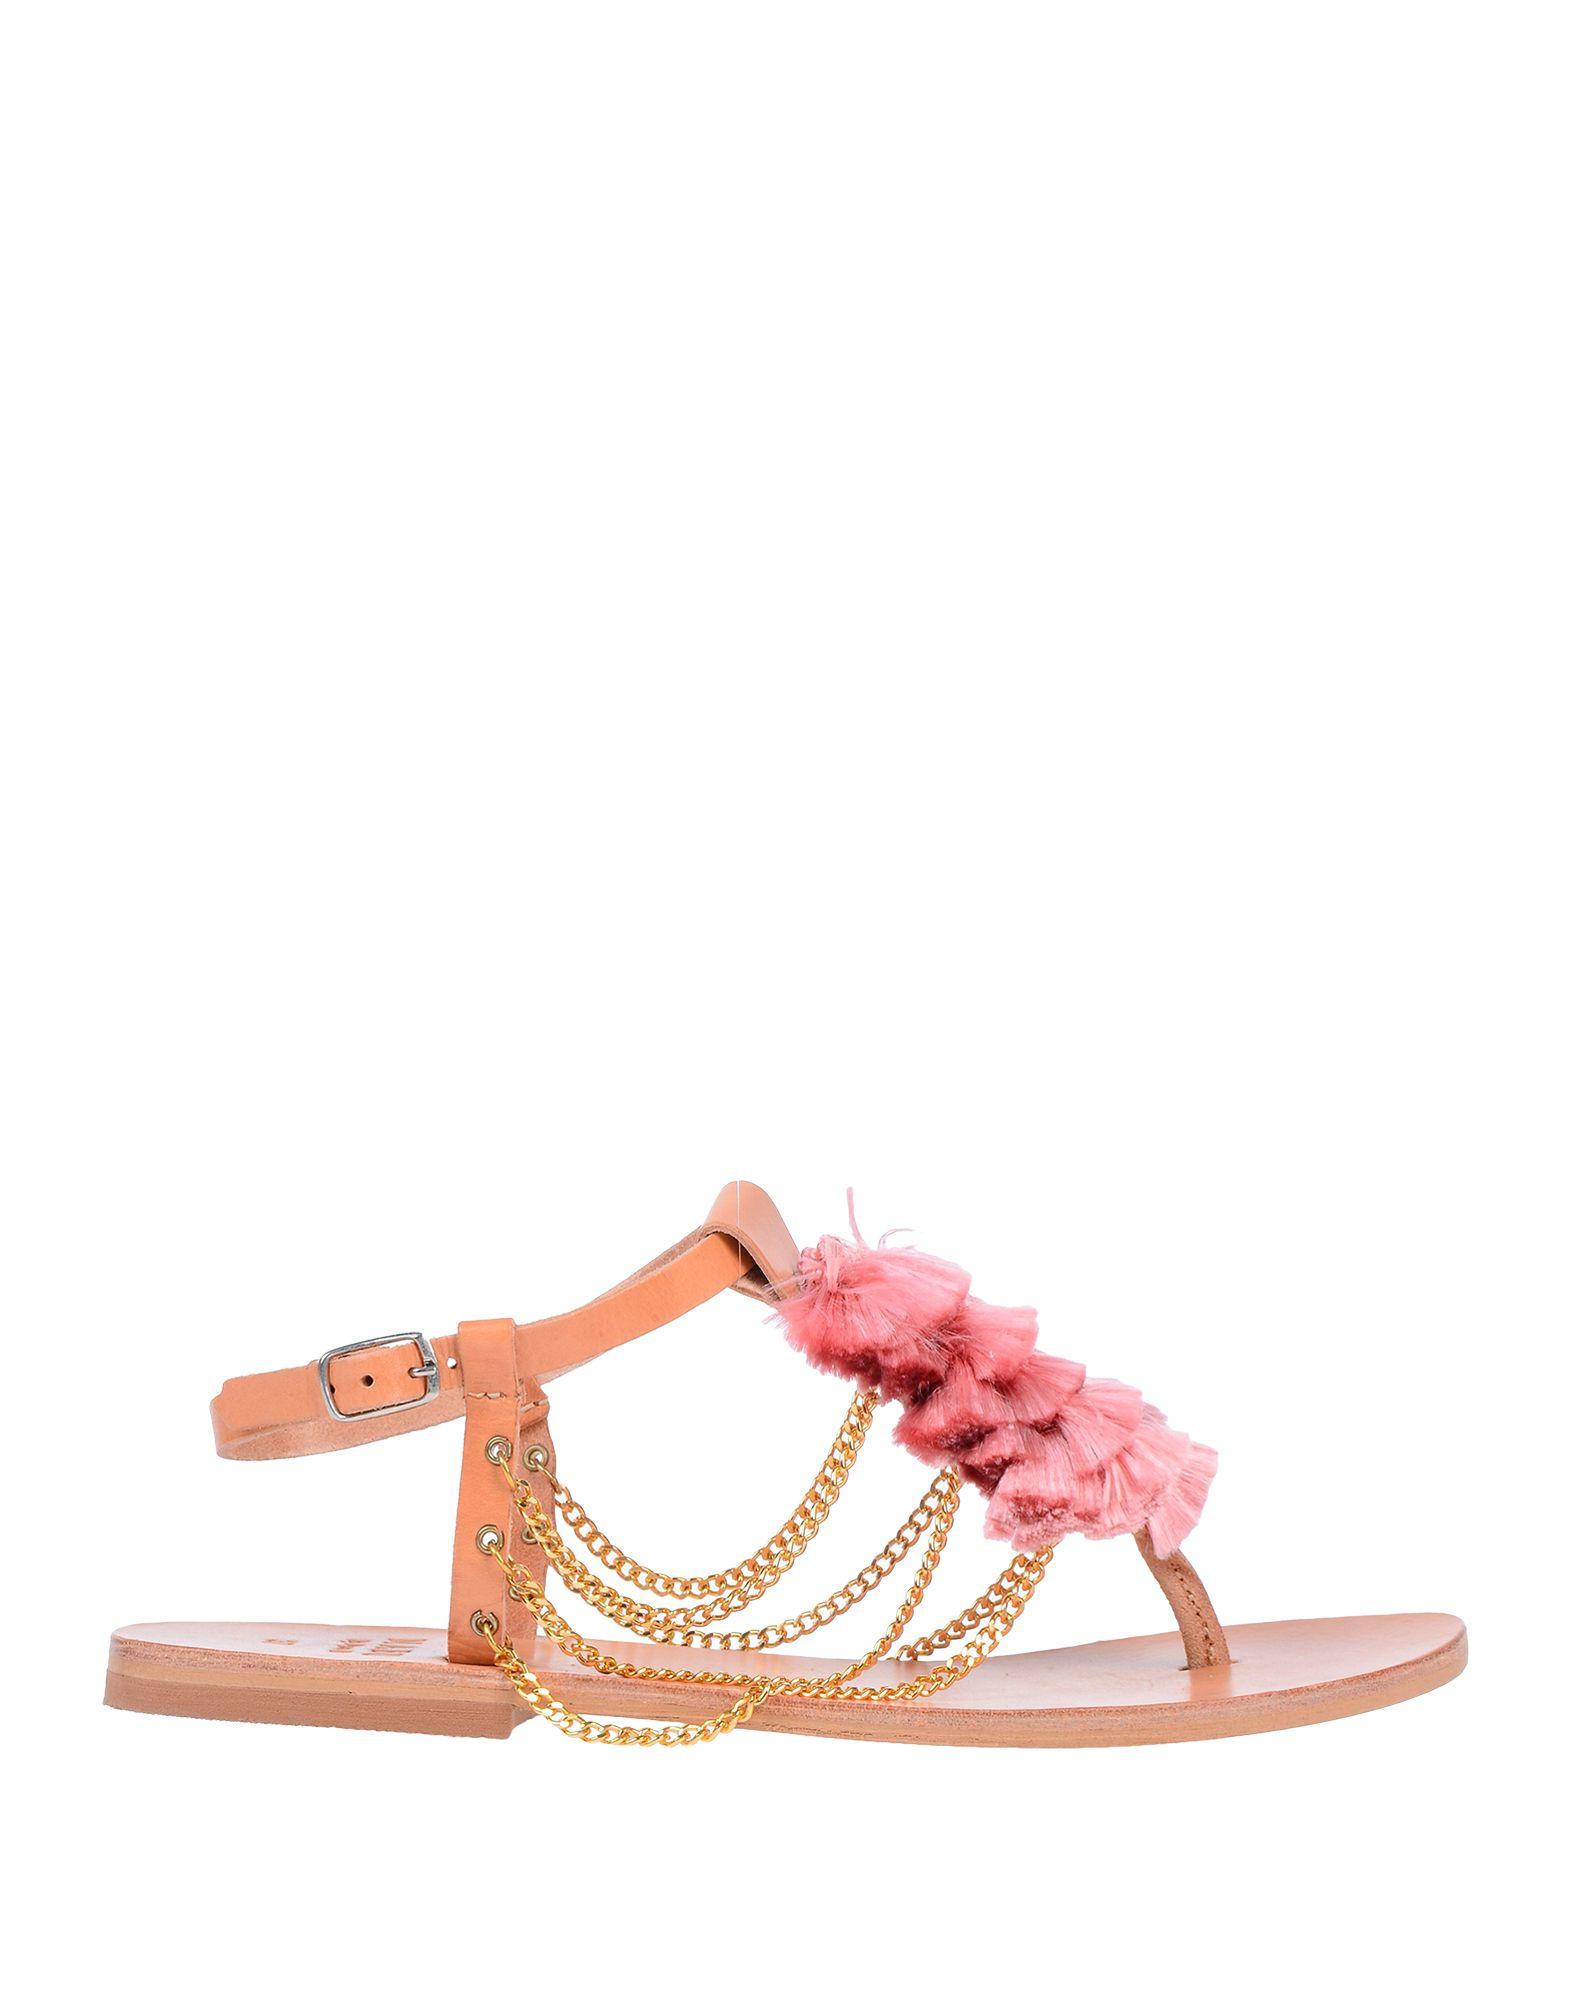 MABU BY MARIA BK Flip flops,11633878GW 7